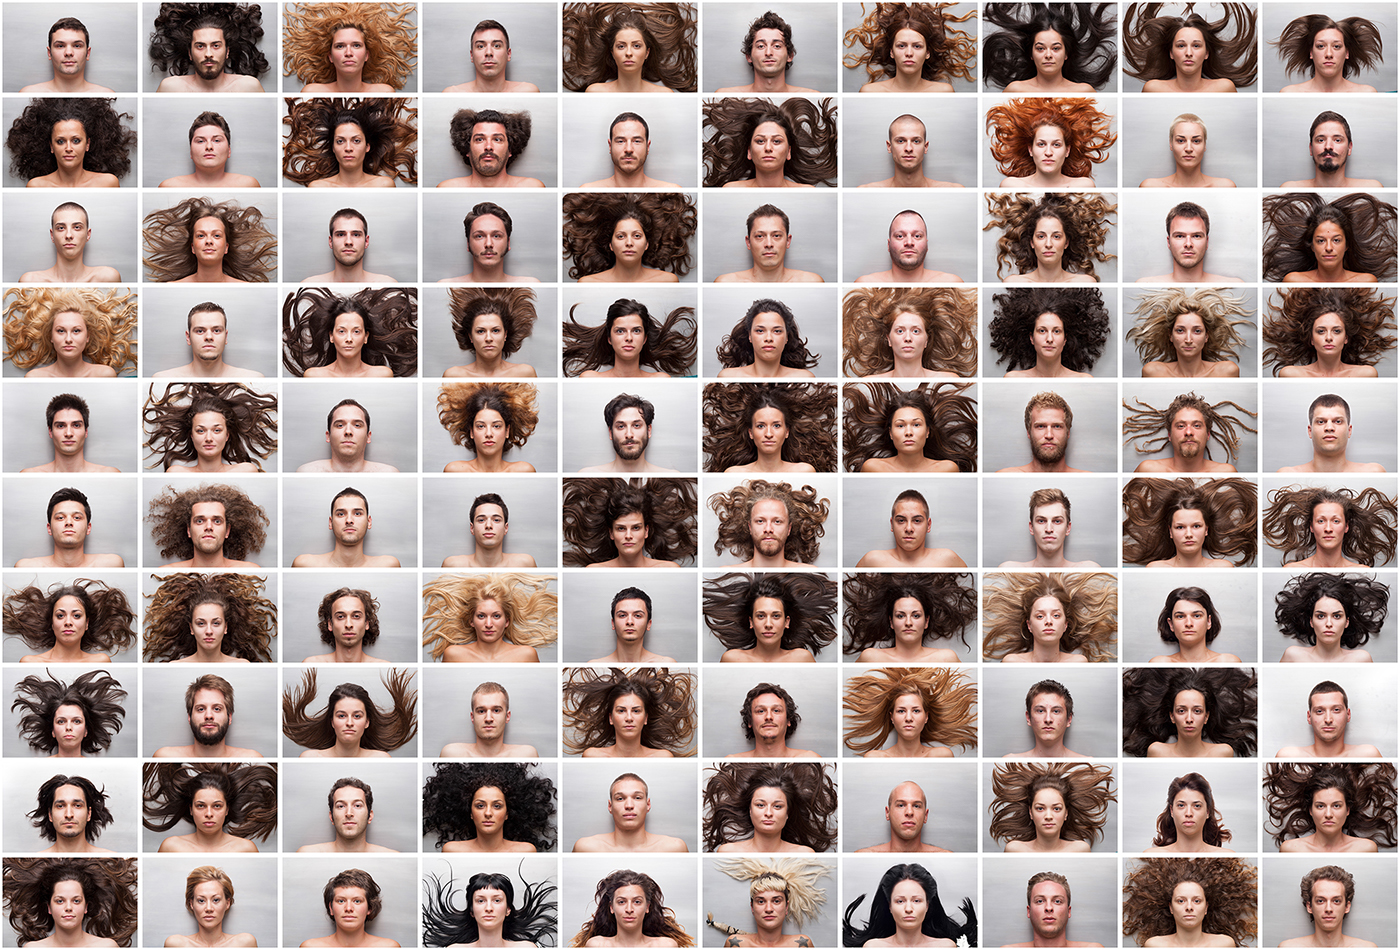 luka Klikovac memento life death time faces portraits